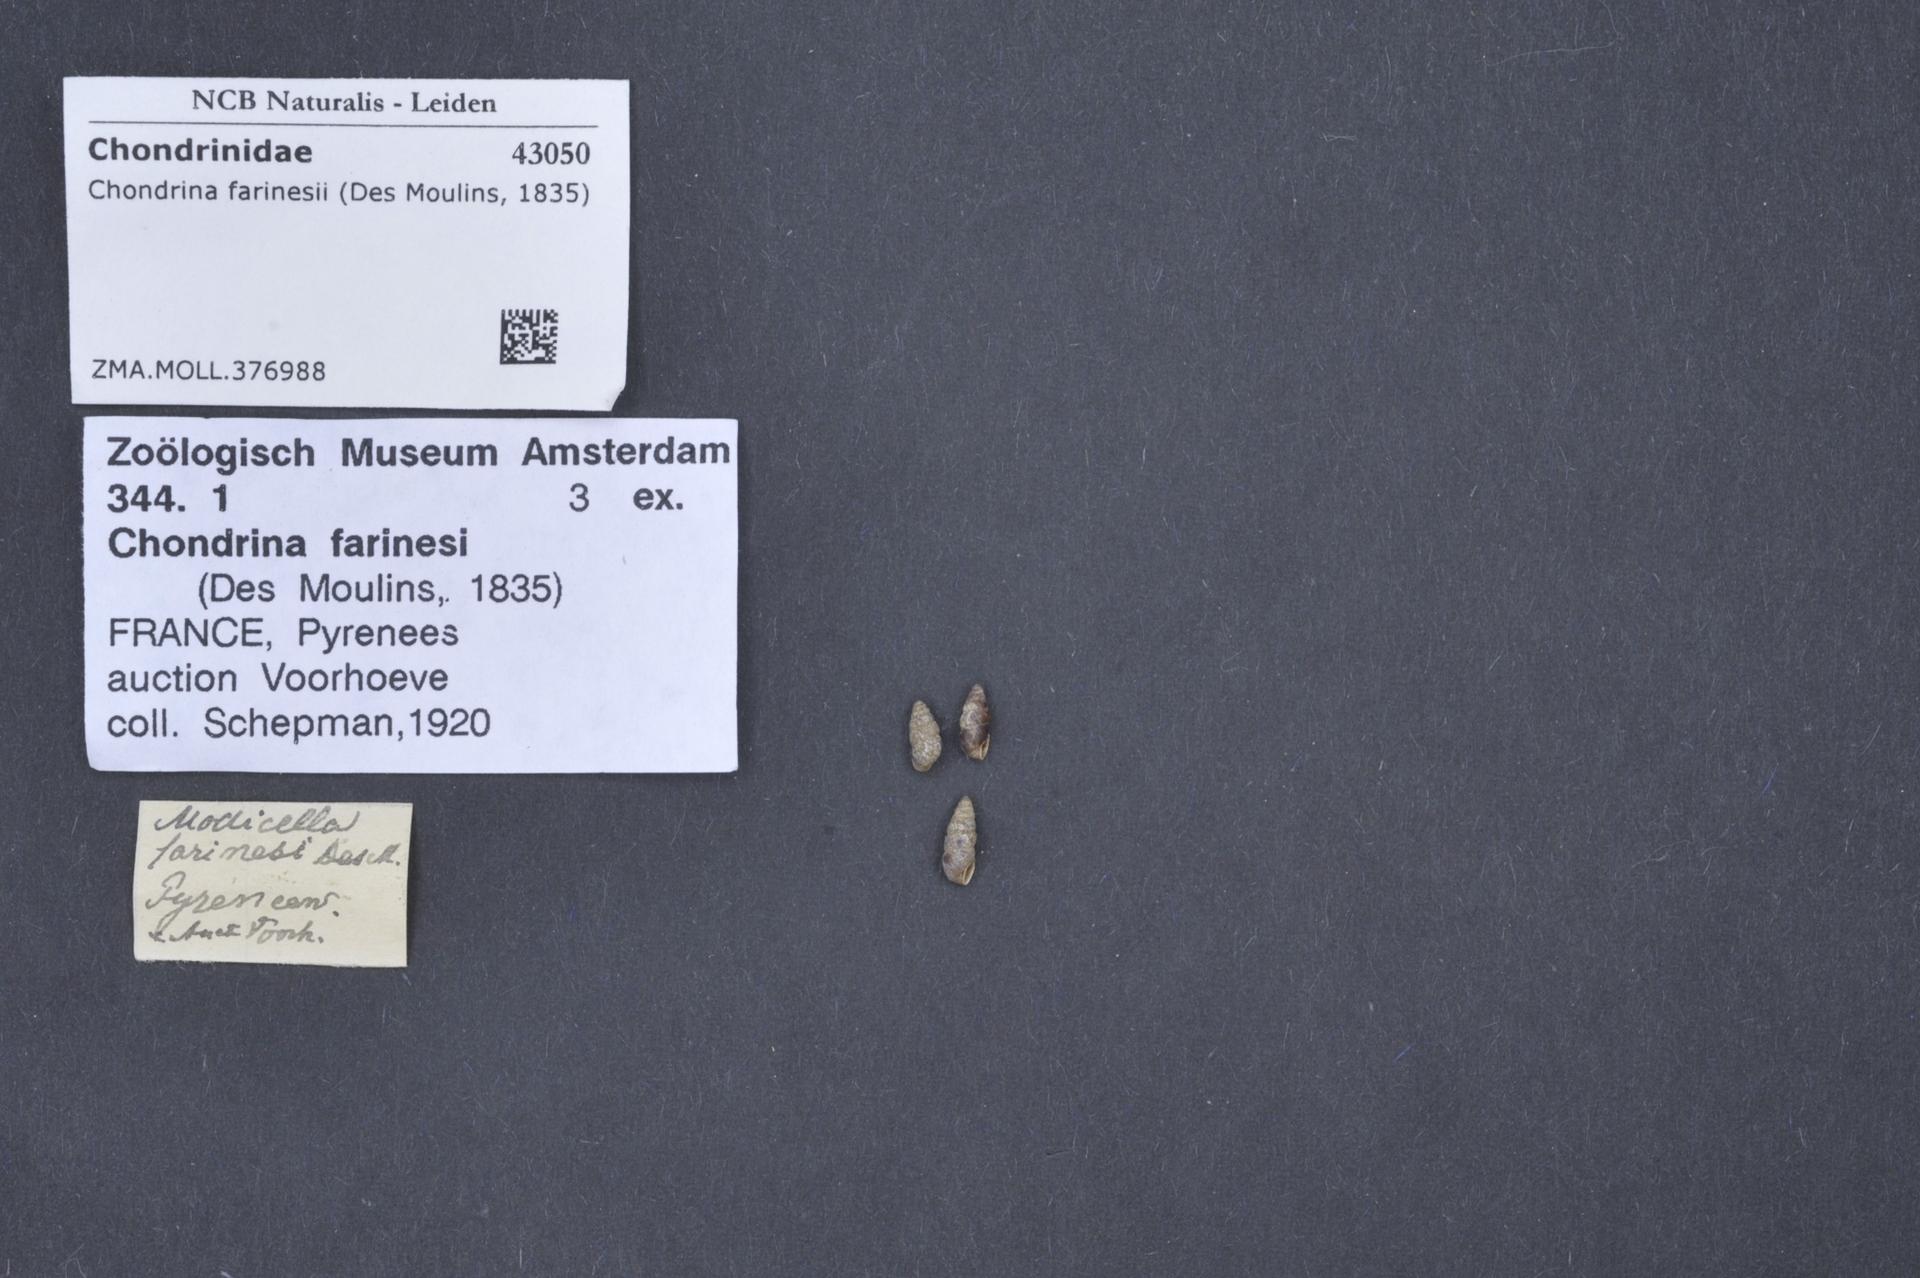 ZMA.MOLL.376988 | Chondrina farinesii (Des Moulins, 1835)